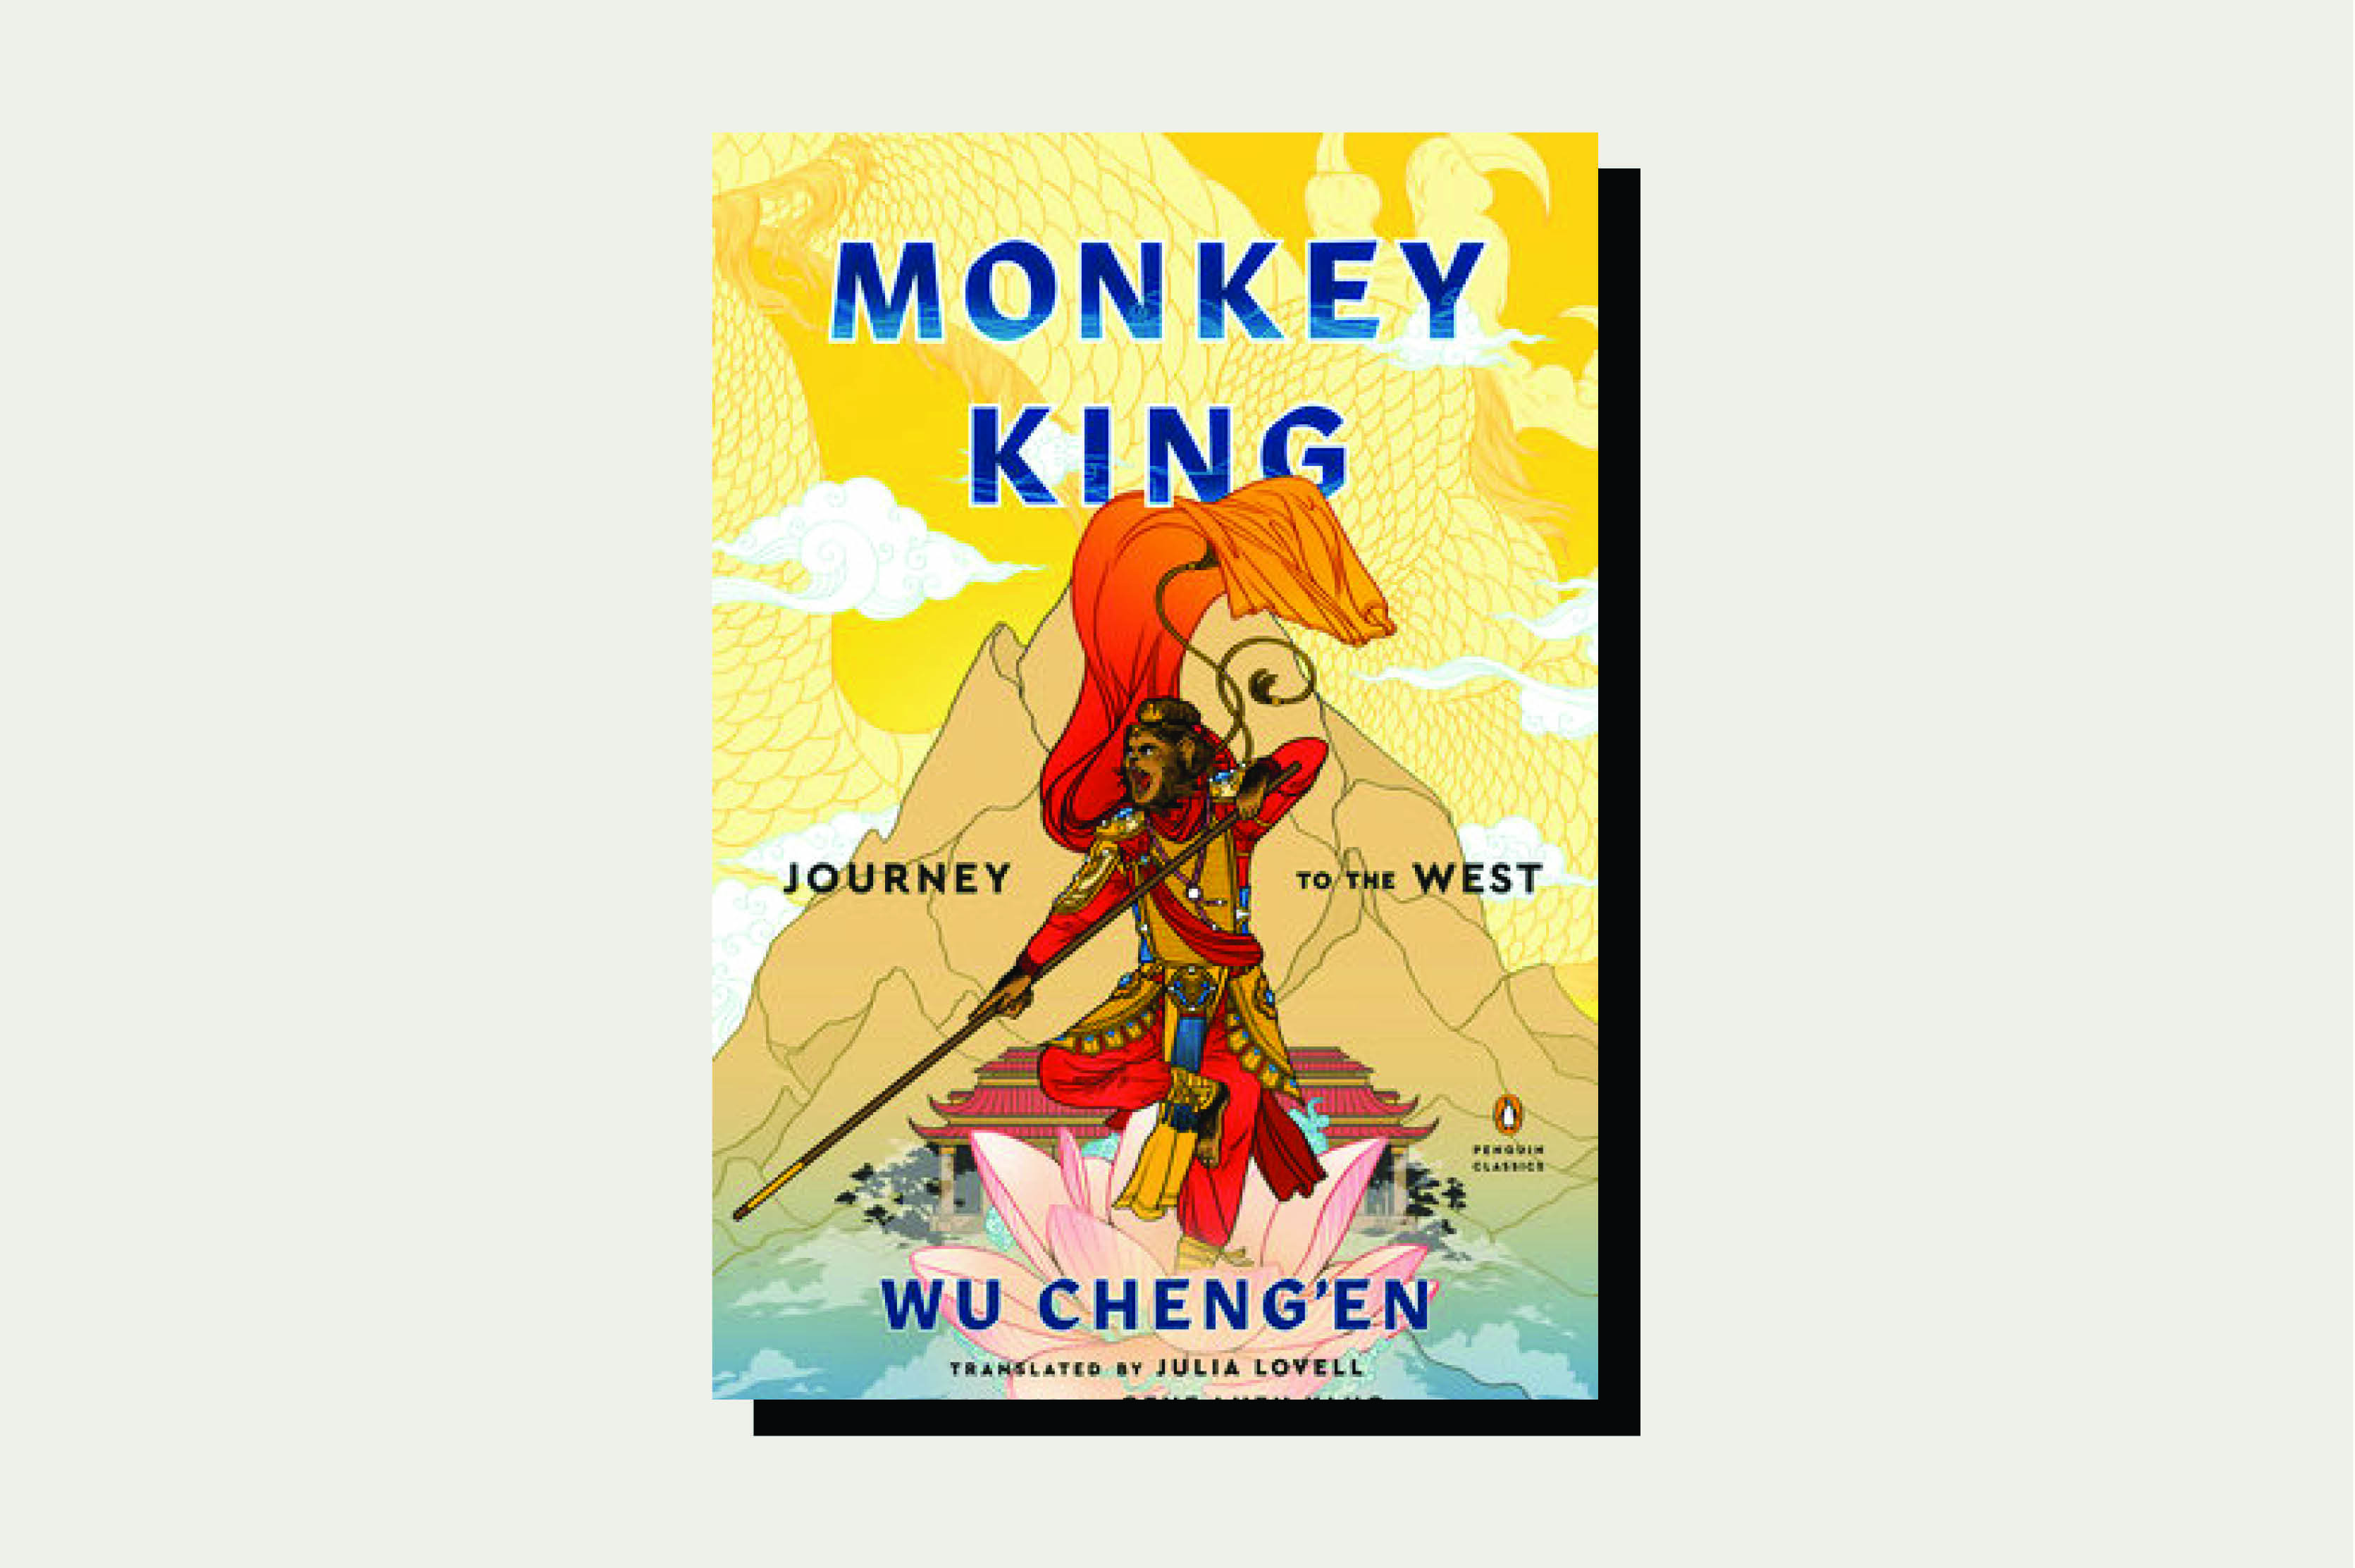 Monkey King: Journey to the West, by Wu Cheng'en, translated by Julia Lovell, Penguin Random House, Feb. 9, 2021